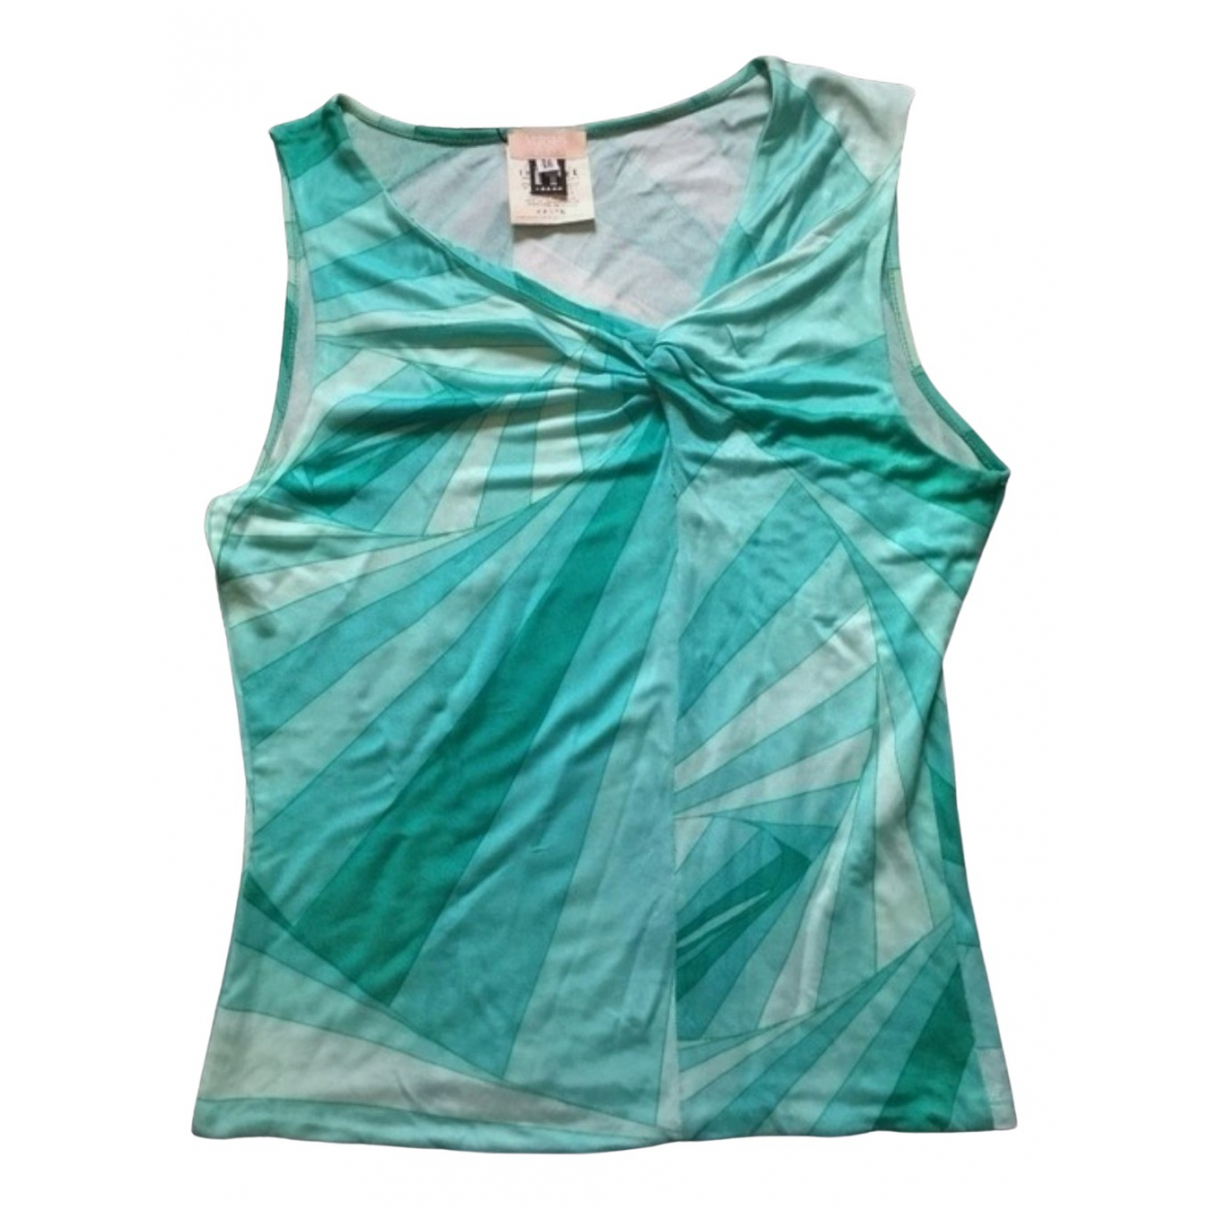 Versace Jean - Top   pour femme - turquoise